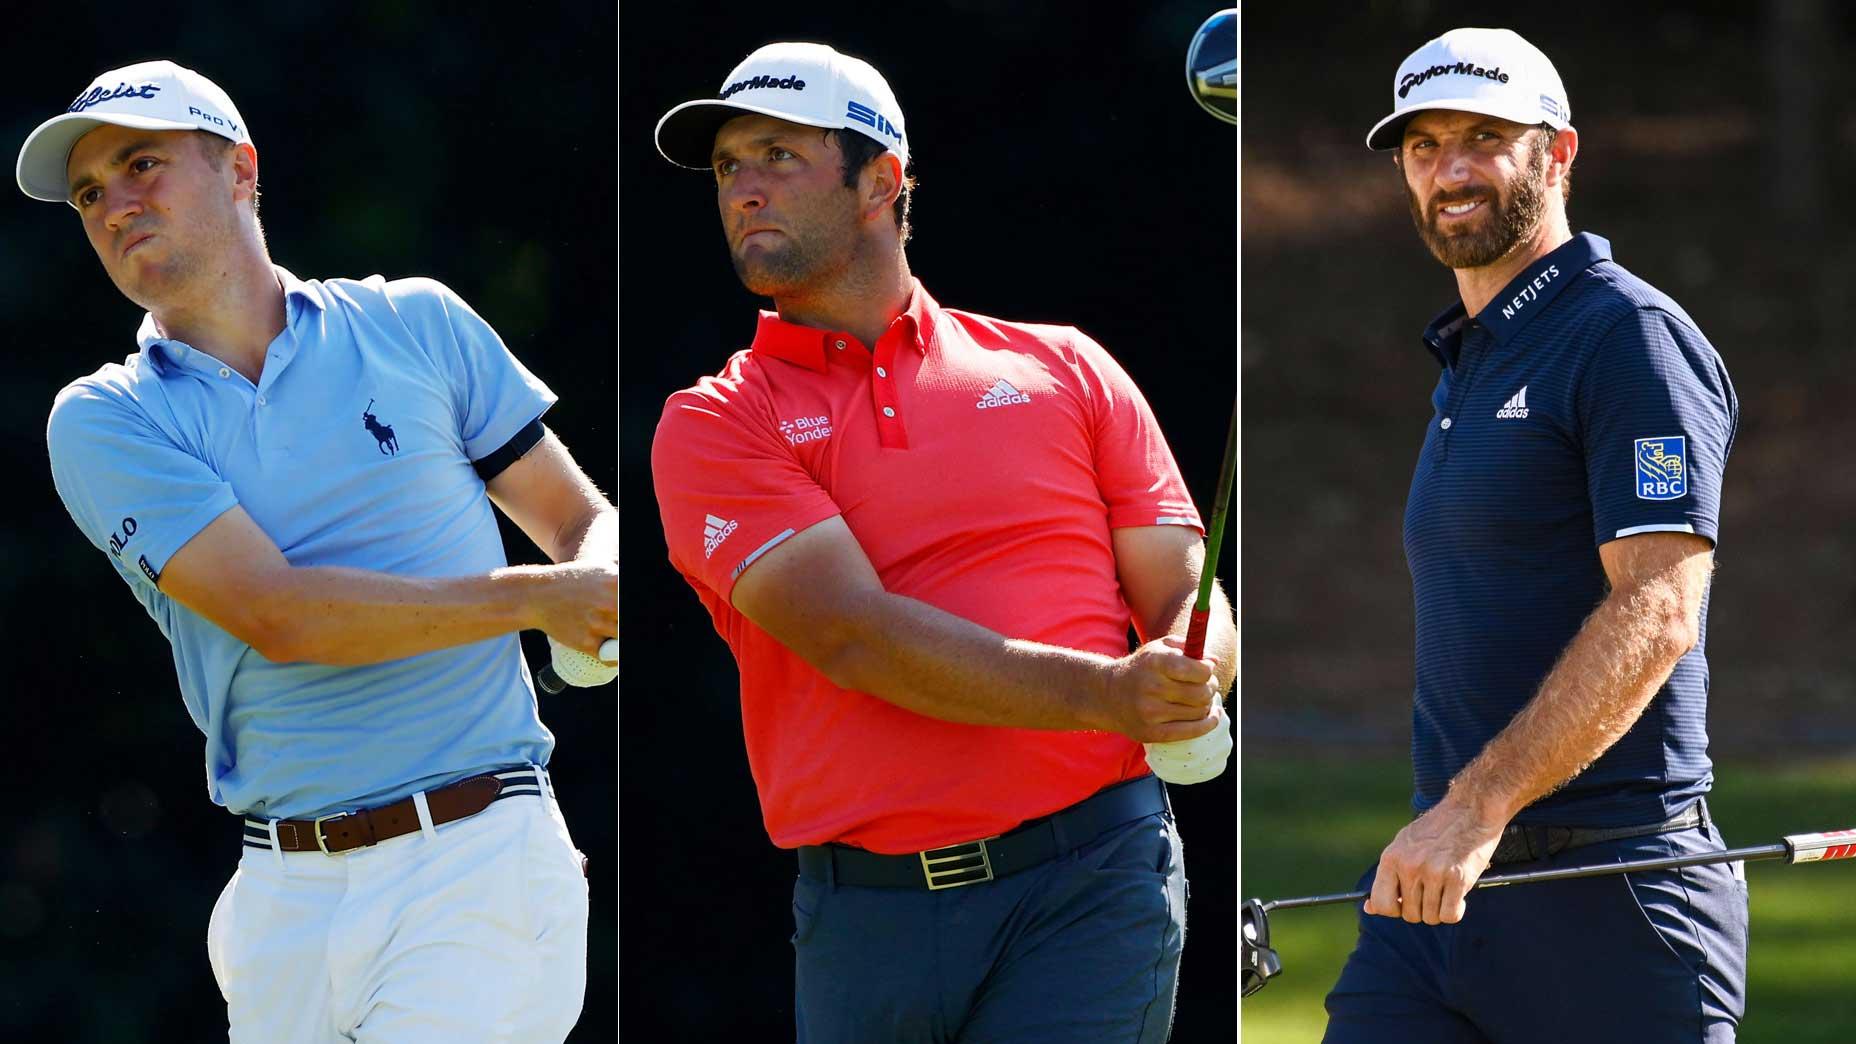 Pro golfers Justin Thomas, Jon Rahm and Dustin Johnson